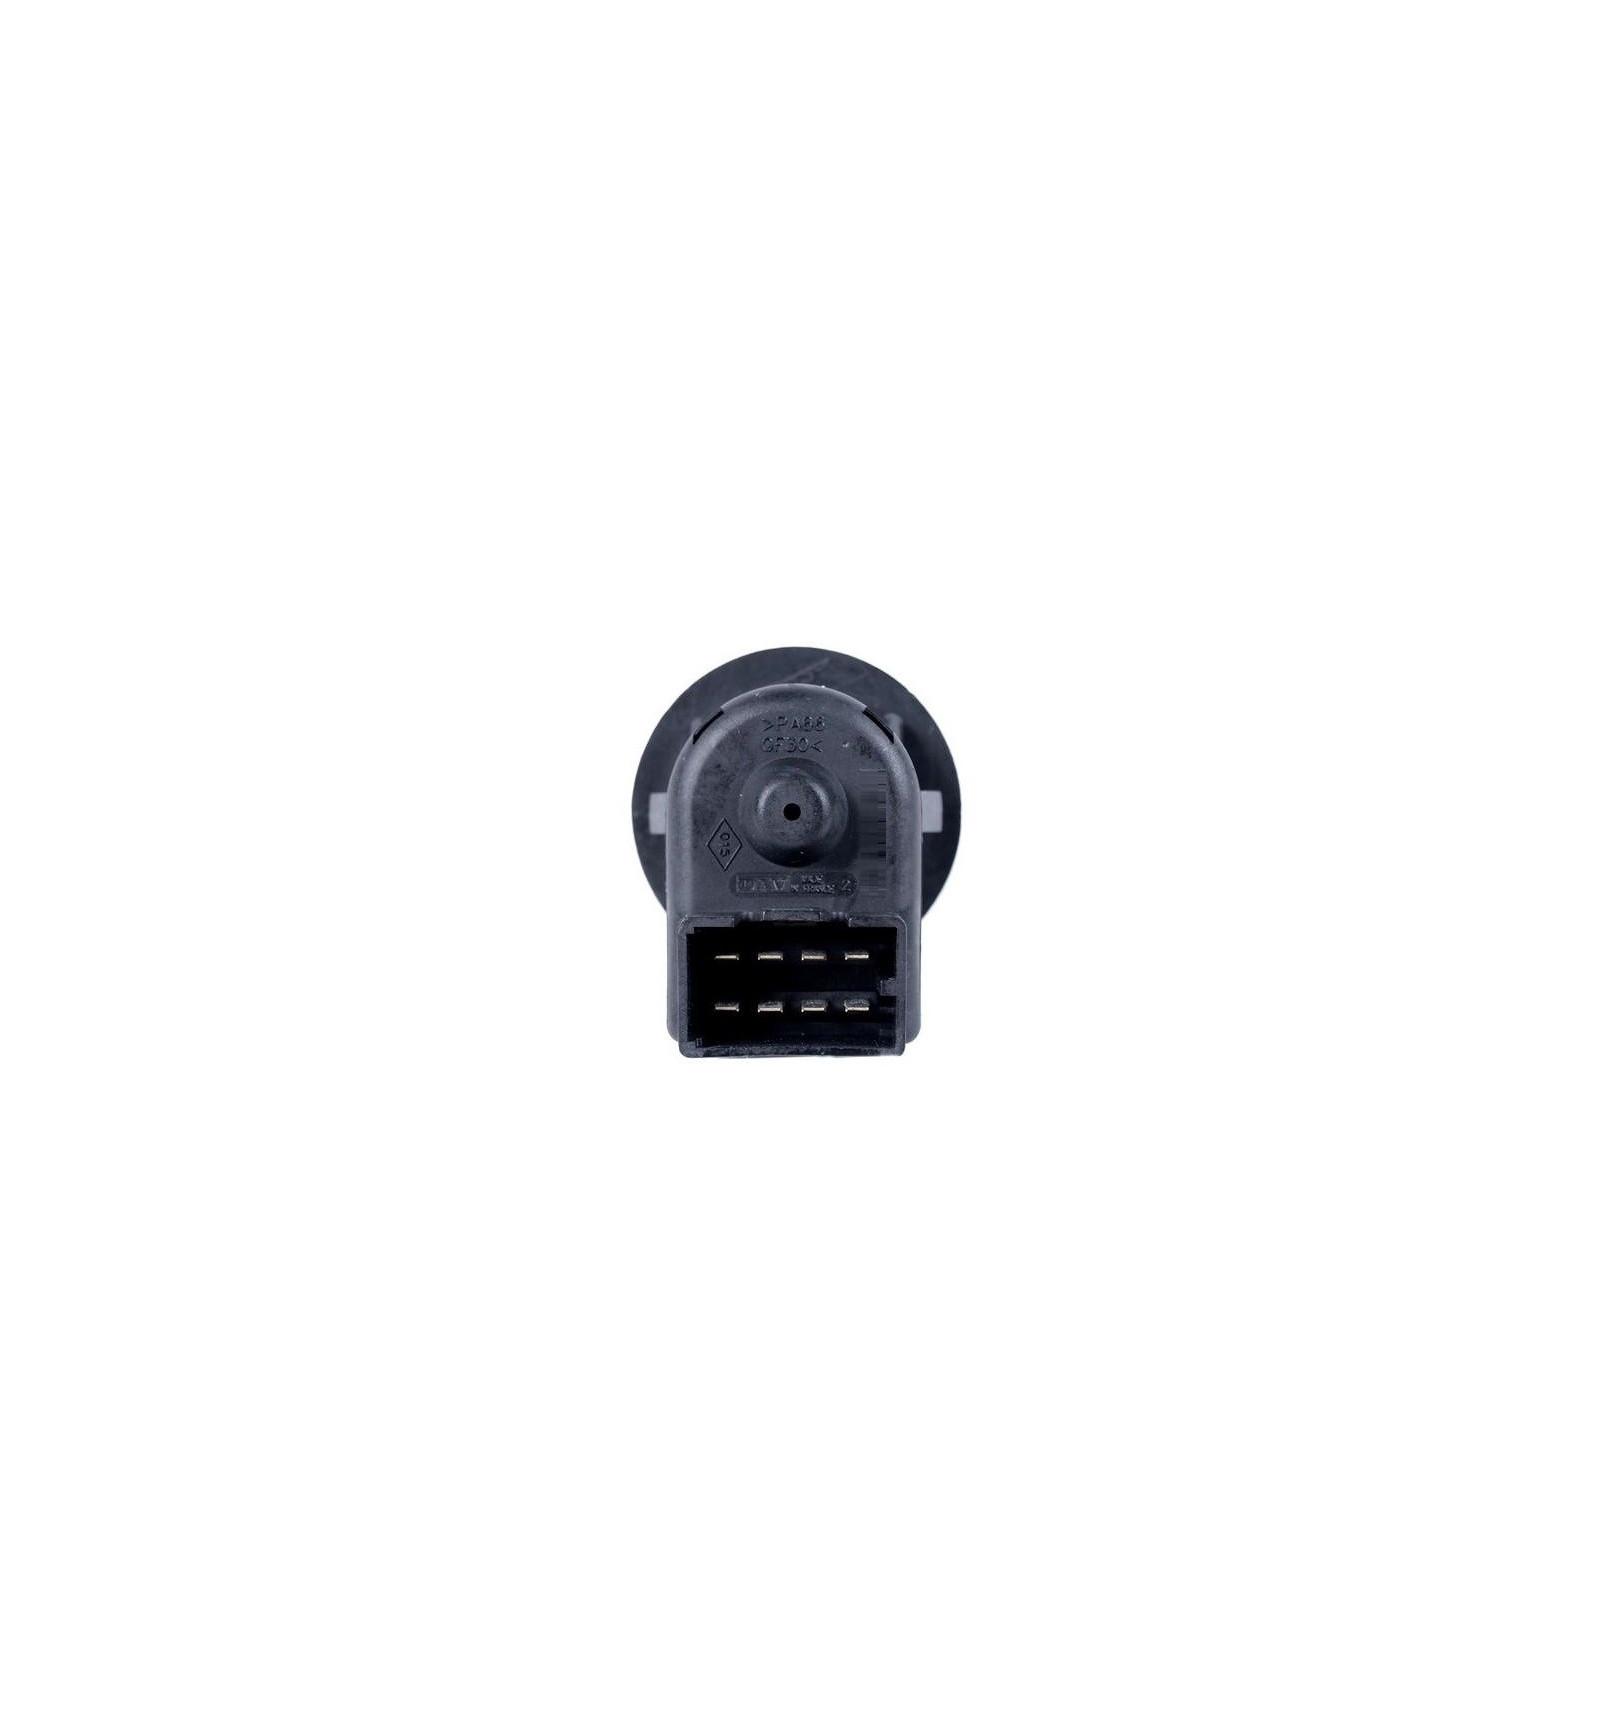 bouton de reglage retroviseur electrique renault. Black Bedroom Furniture Sets. Home Design Ideas